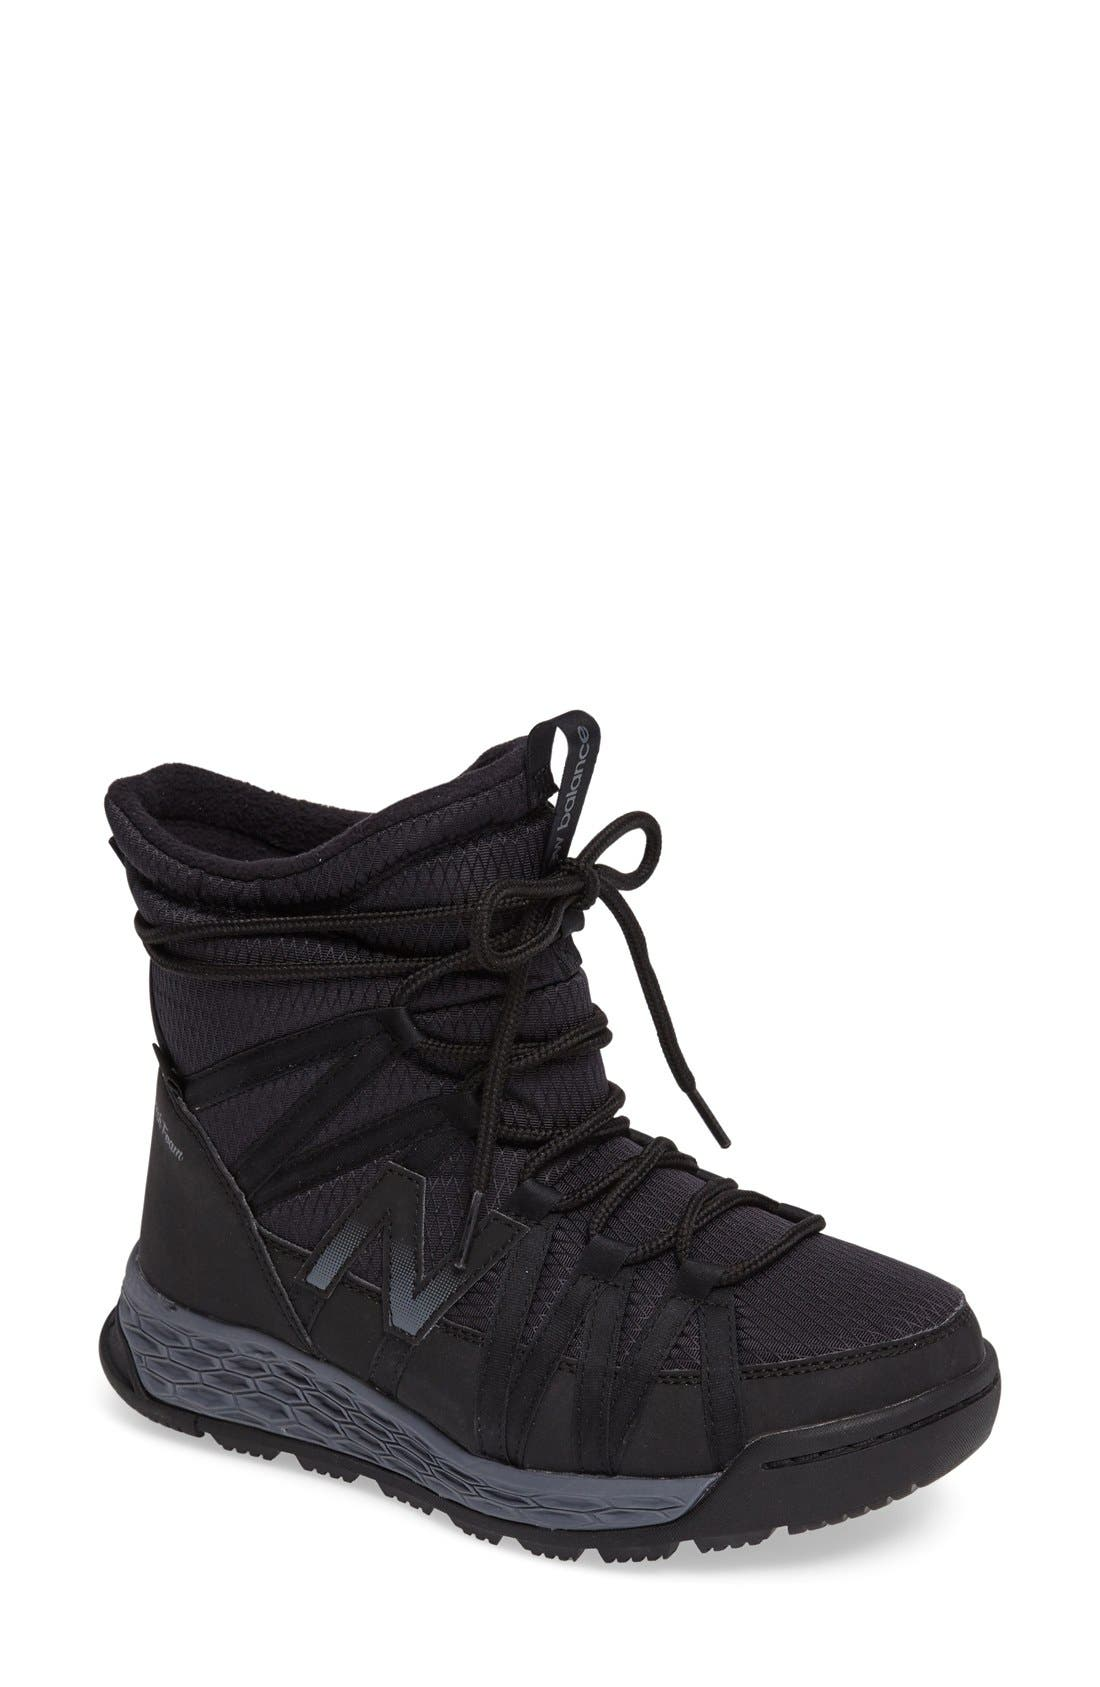 Q416 Weatherproof Snow Boot,                         Main,                         color, 001